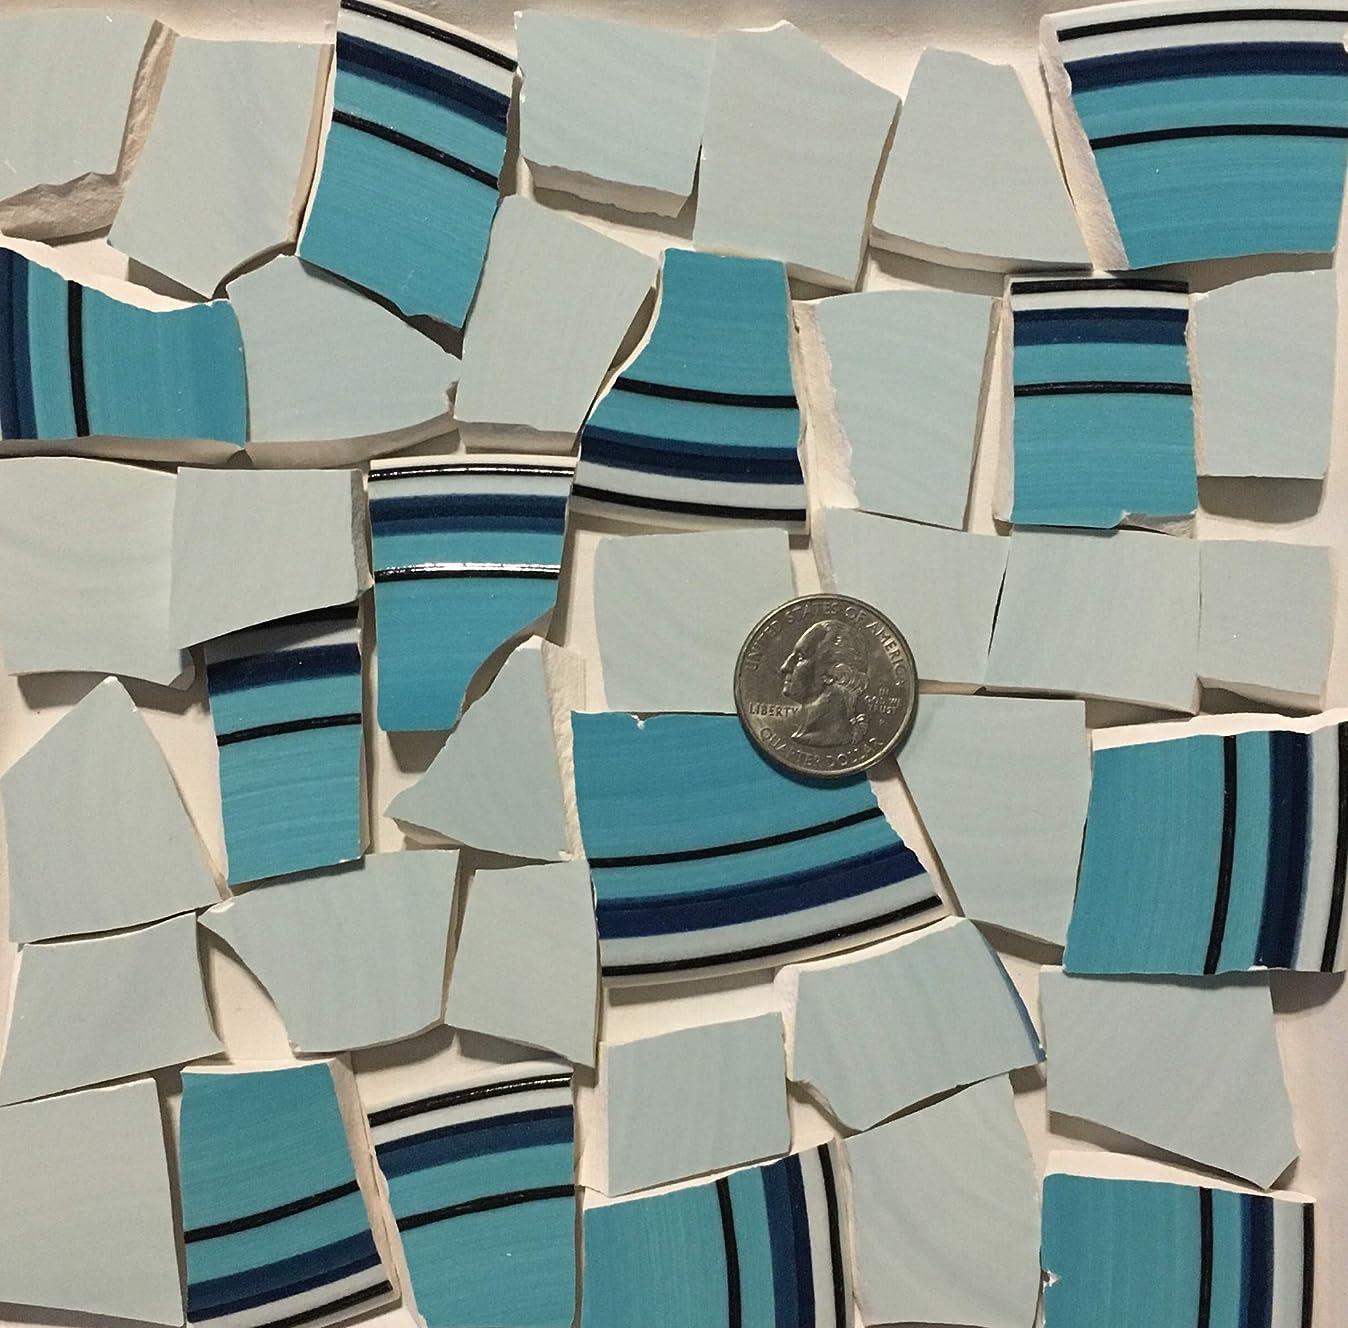 Mosaic Art & Crafts Supply ~ Turquoise Blue & Navy Rim Tiles w/Pale Blue (B744) y7943110354